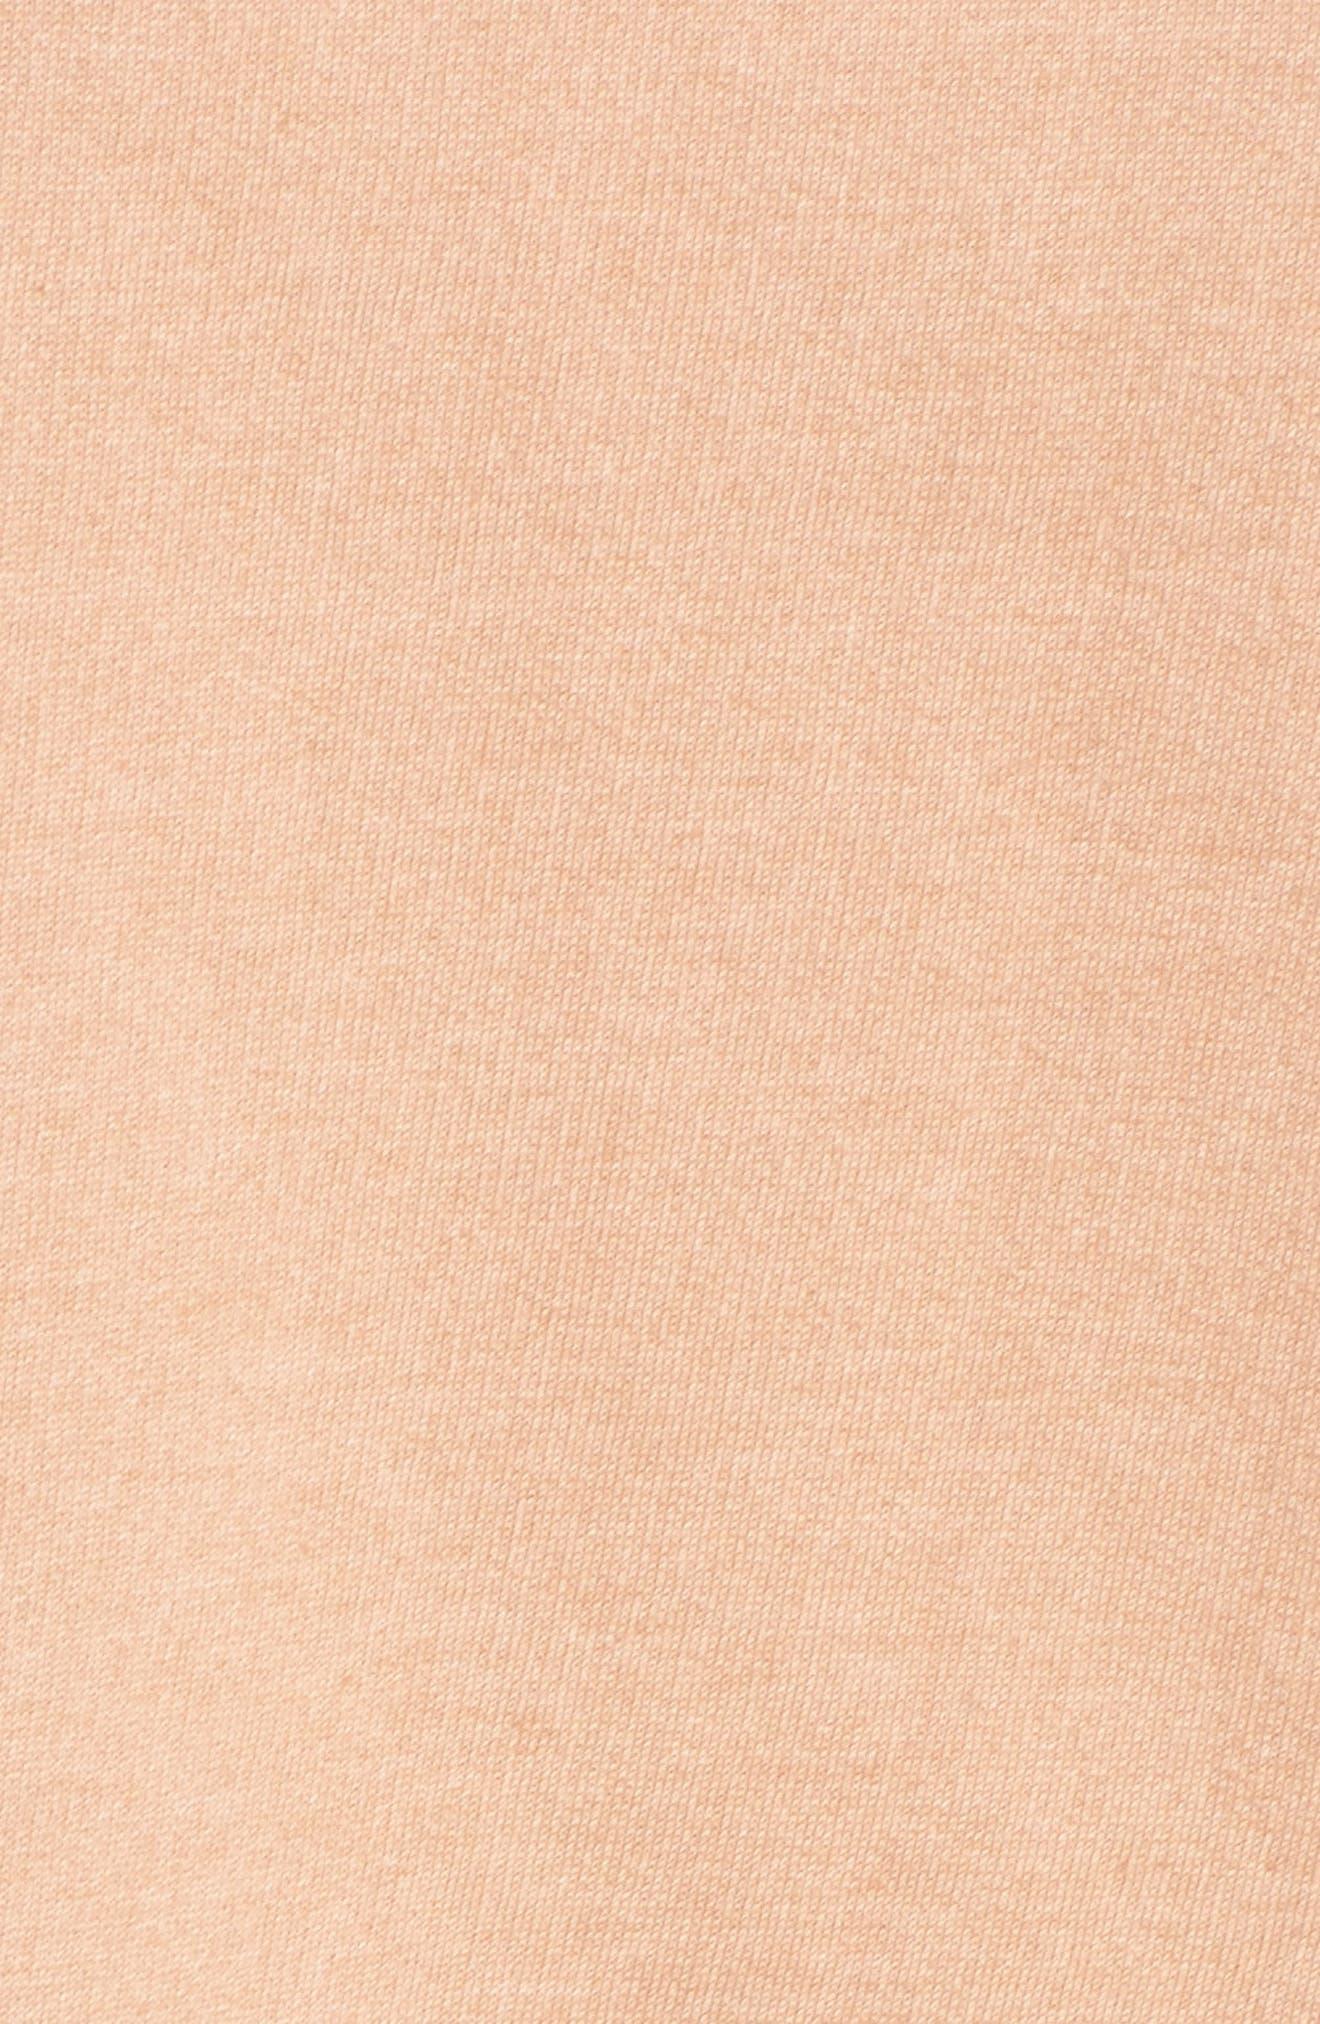 Middle Sister Brunette Sweatshirt,                             Alternate thumbnail 7, color,                             Rose